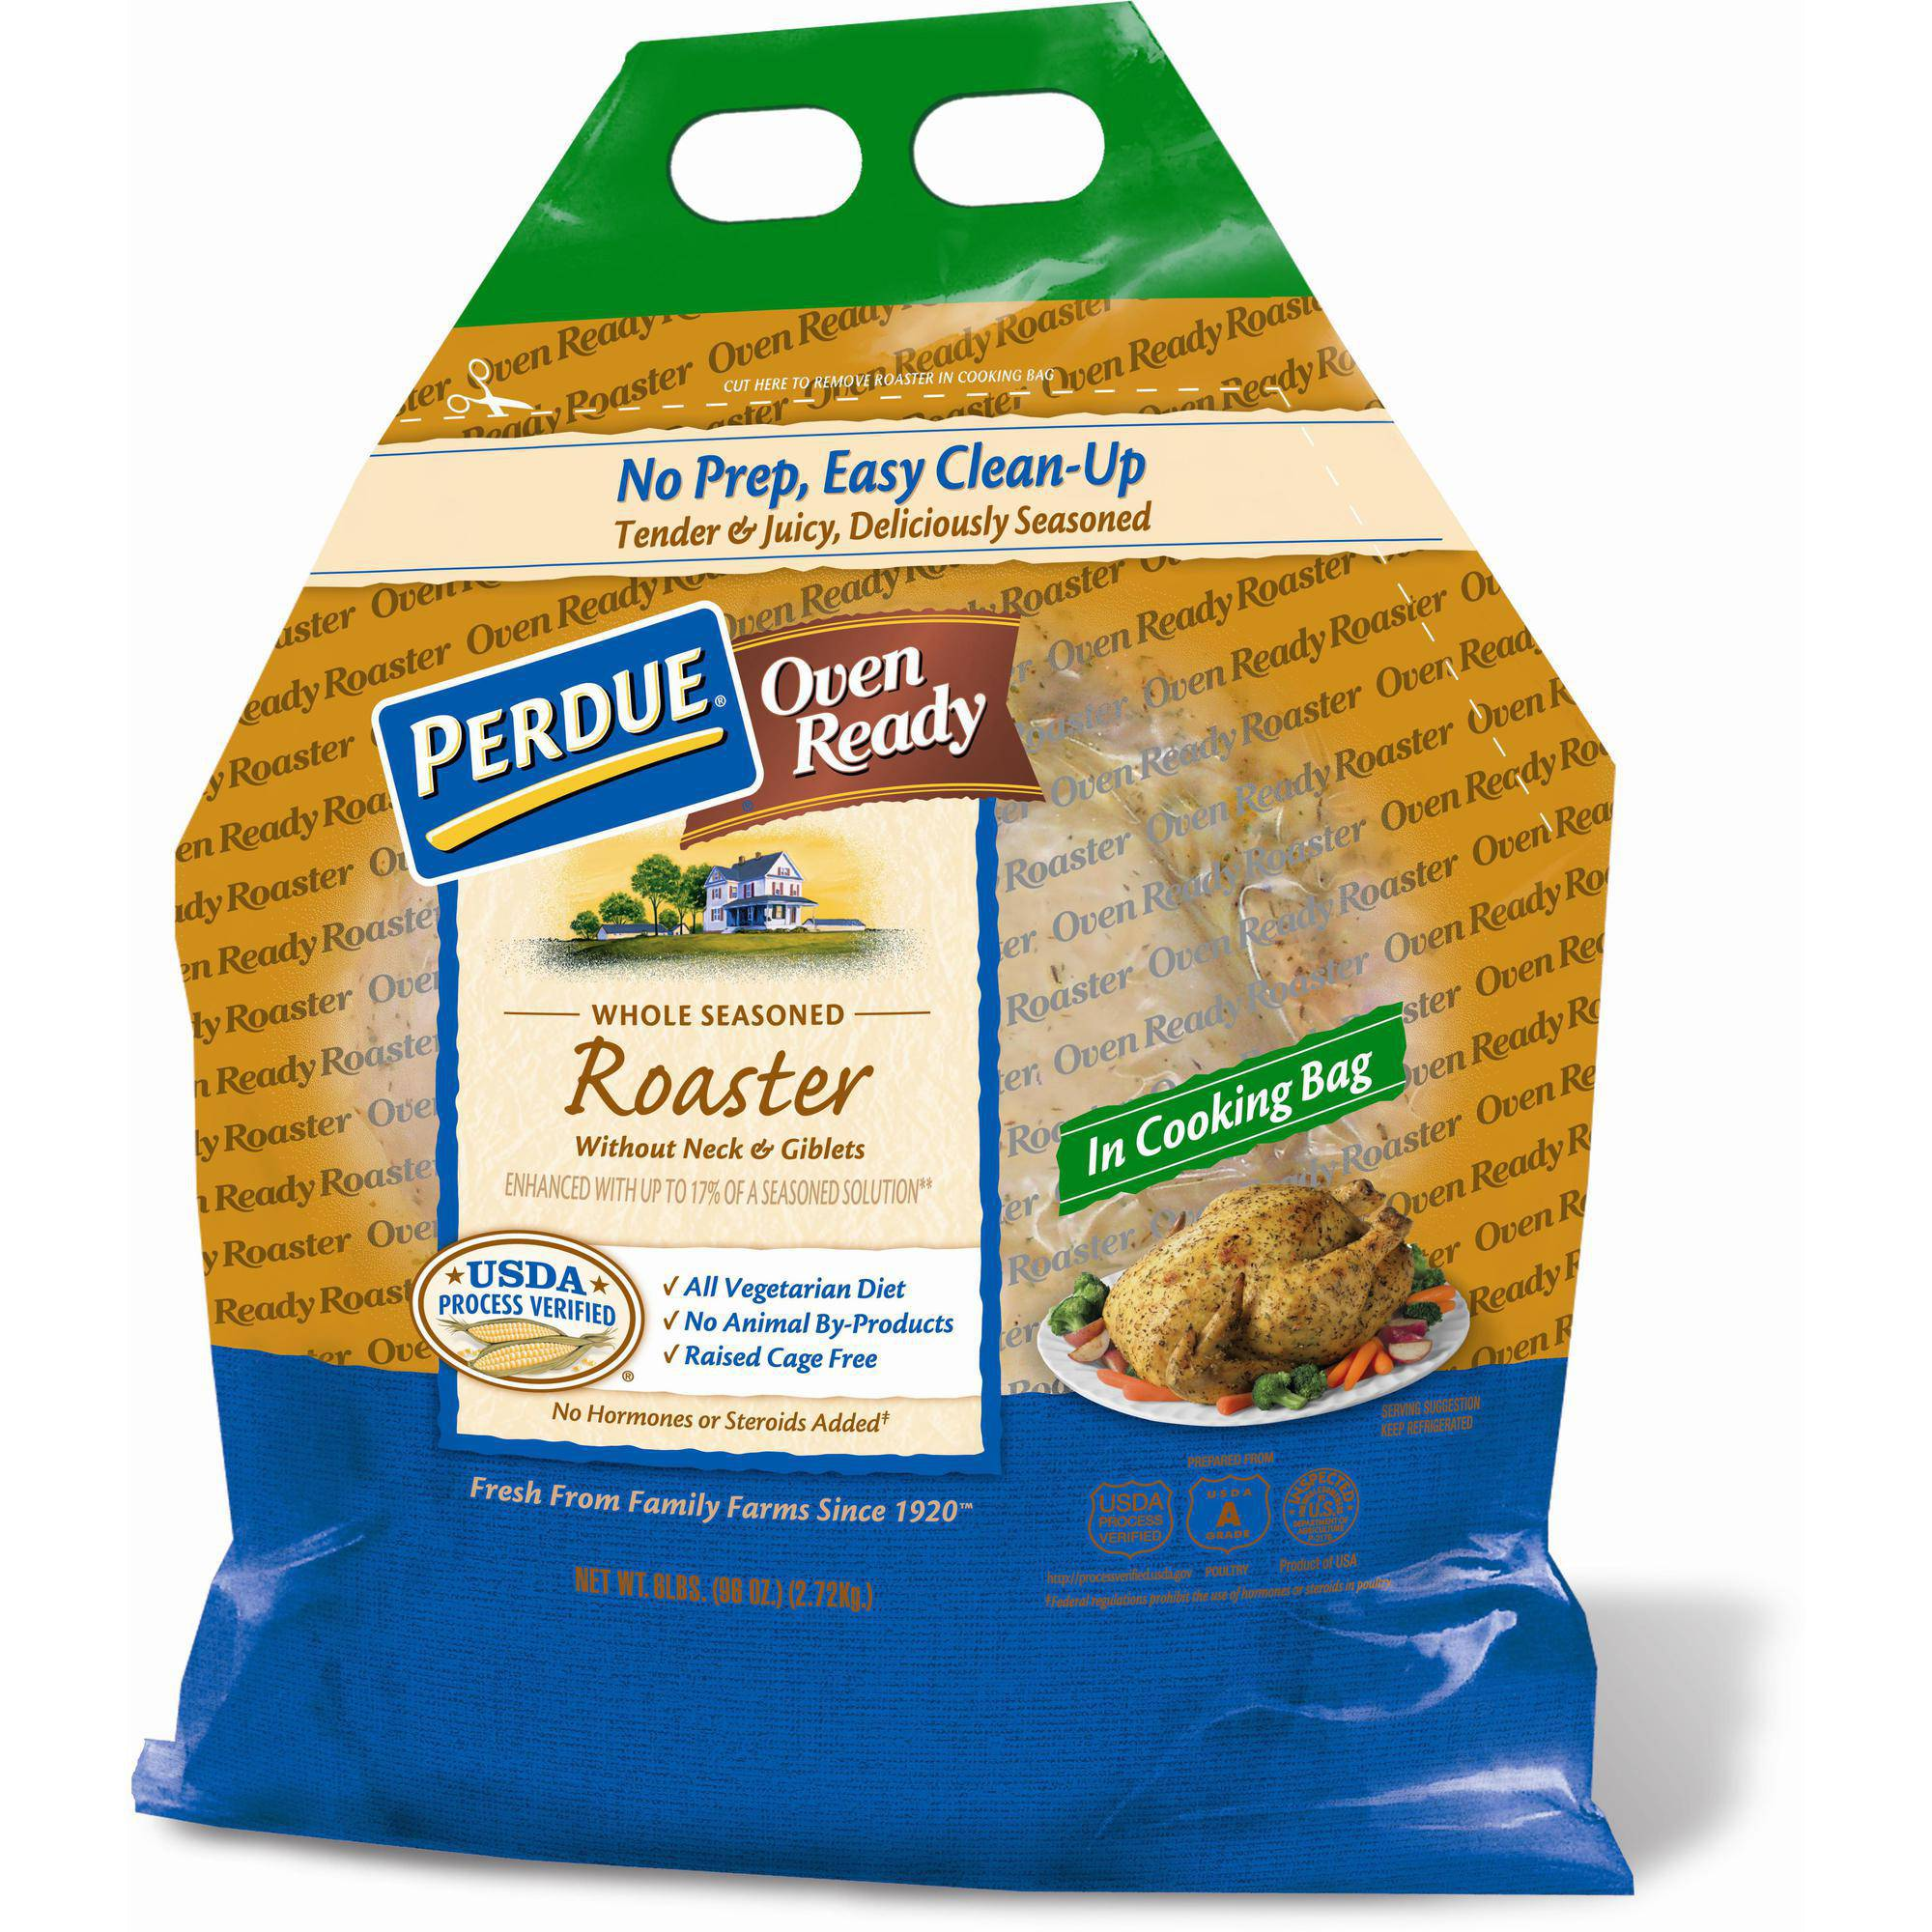 Perdue Oven Ready Whole Seasoned Roaster Chicken, 6 lbs